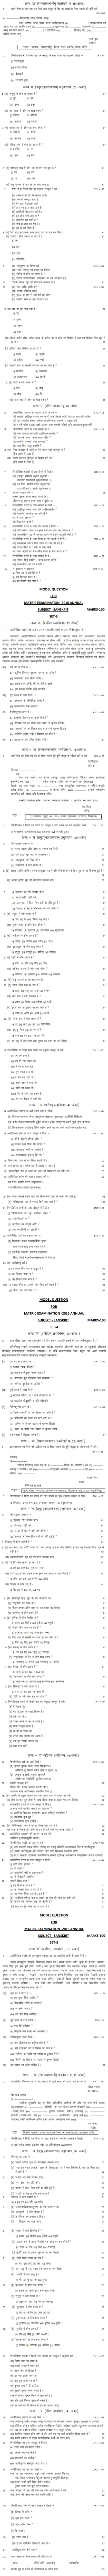 Bihar Board Class X Model Question Papers - Sanskrit